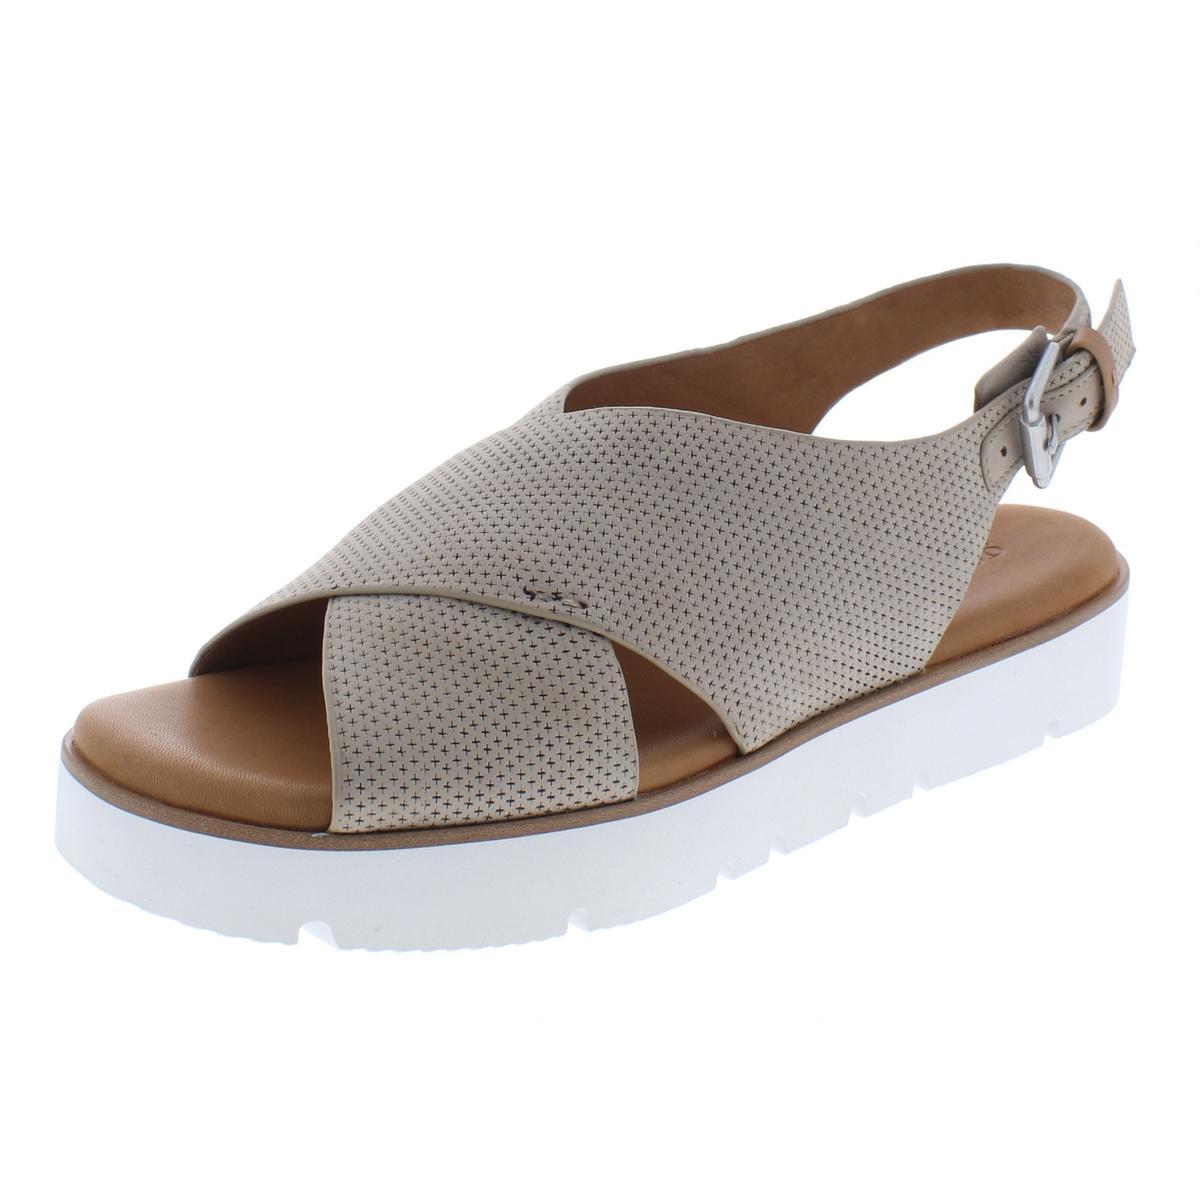 7543a476def Details about Gentle Souls by Kenneth Cole Womens Kiki Platform Sandals 7.5  Medium (B